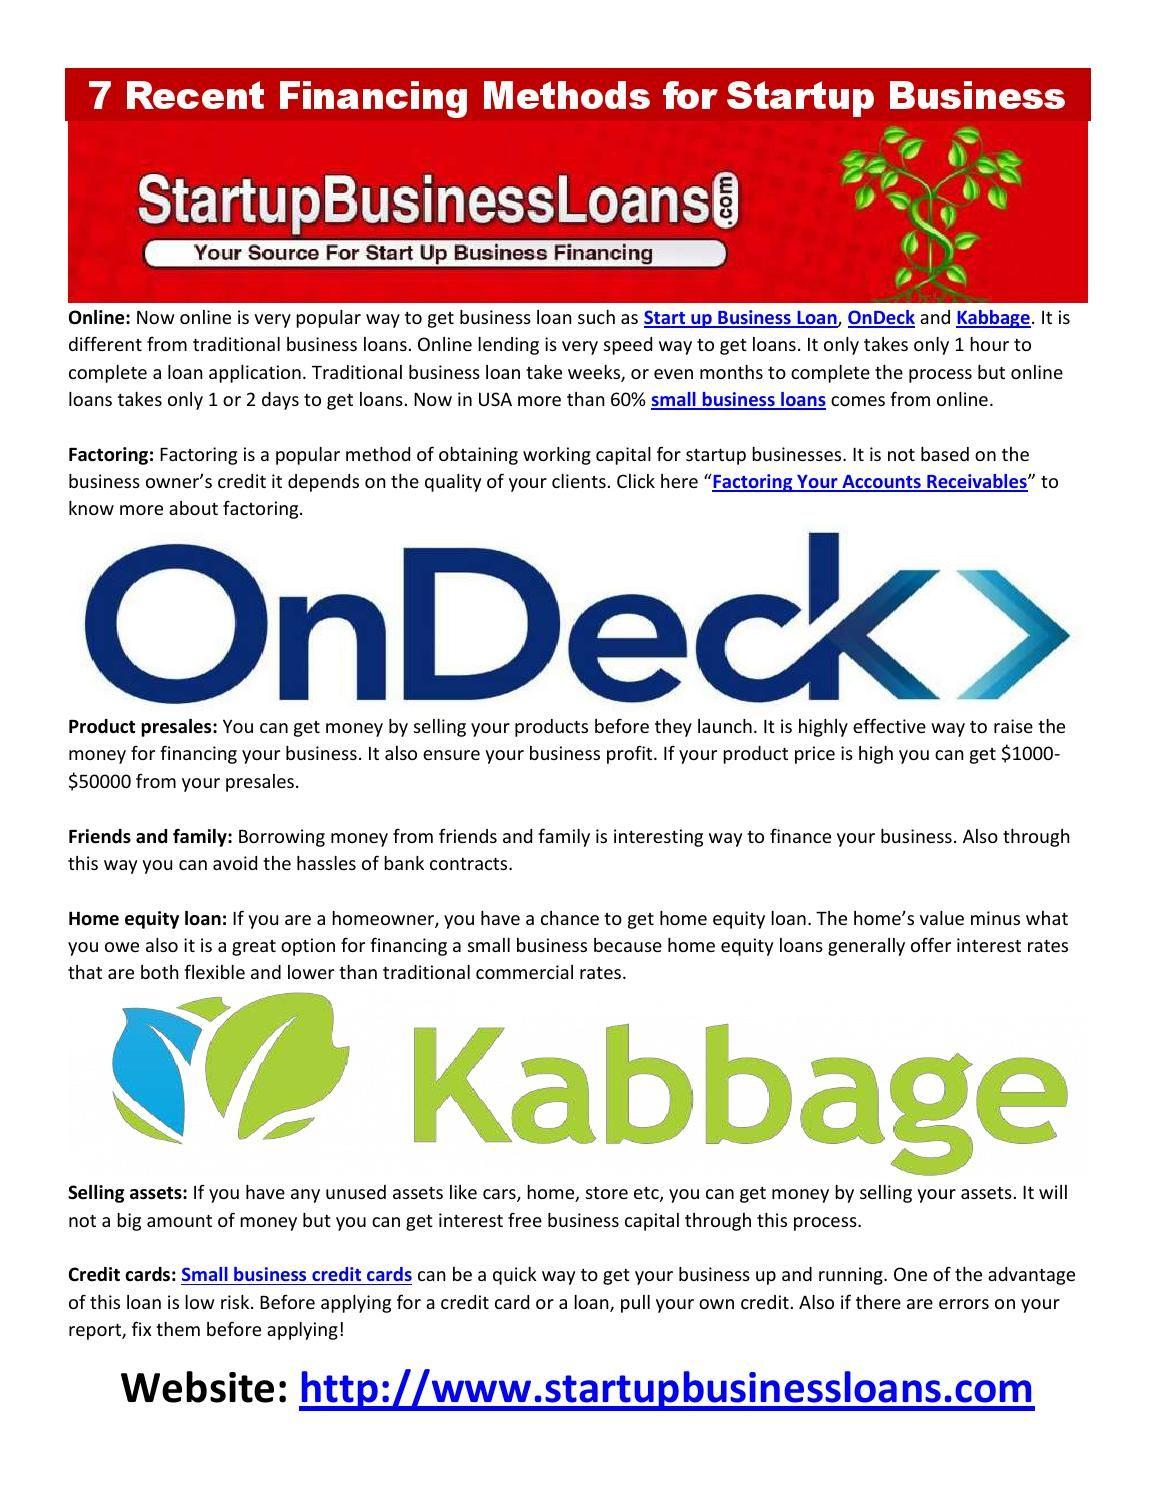 7 Recent Financing Methods For Startup Business Start Up Business Start Up Business Loans